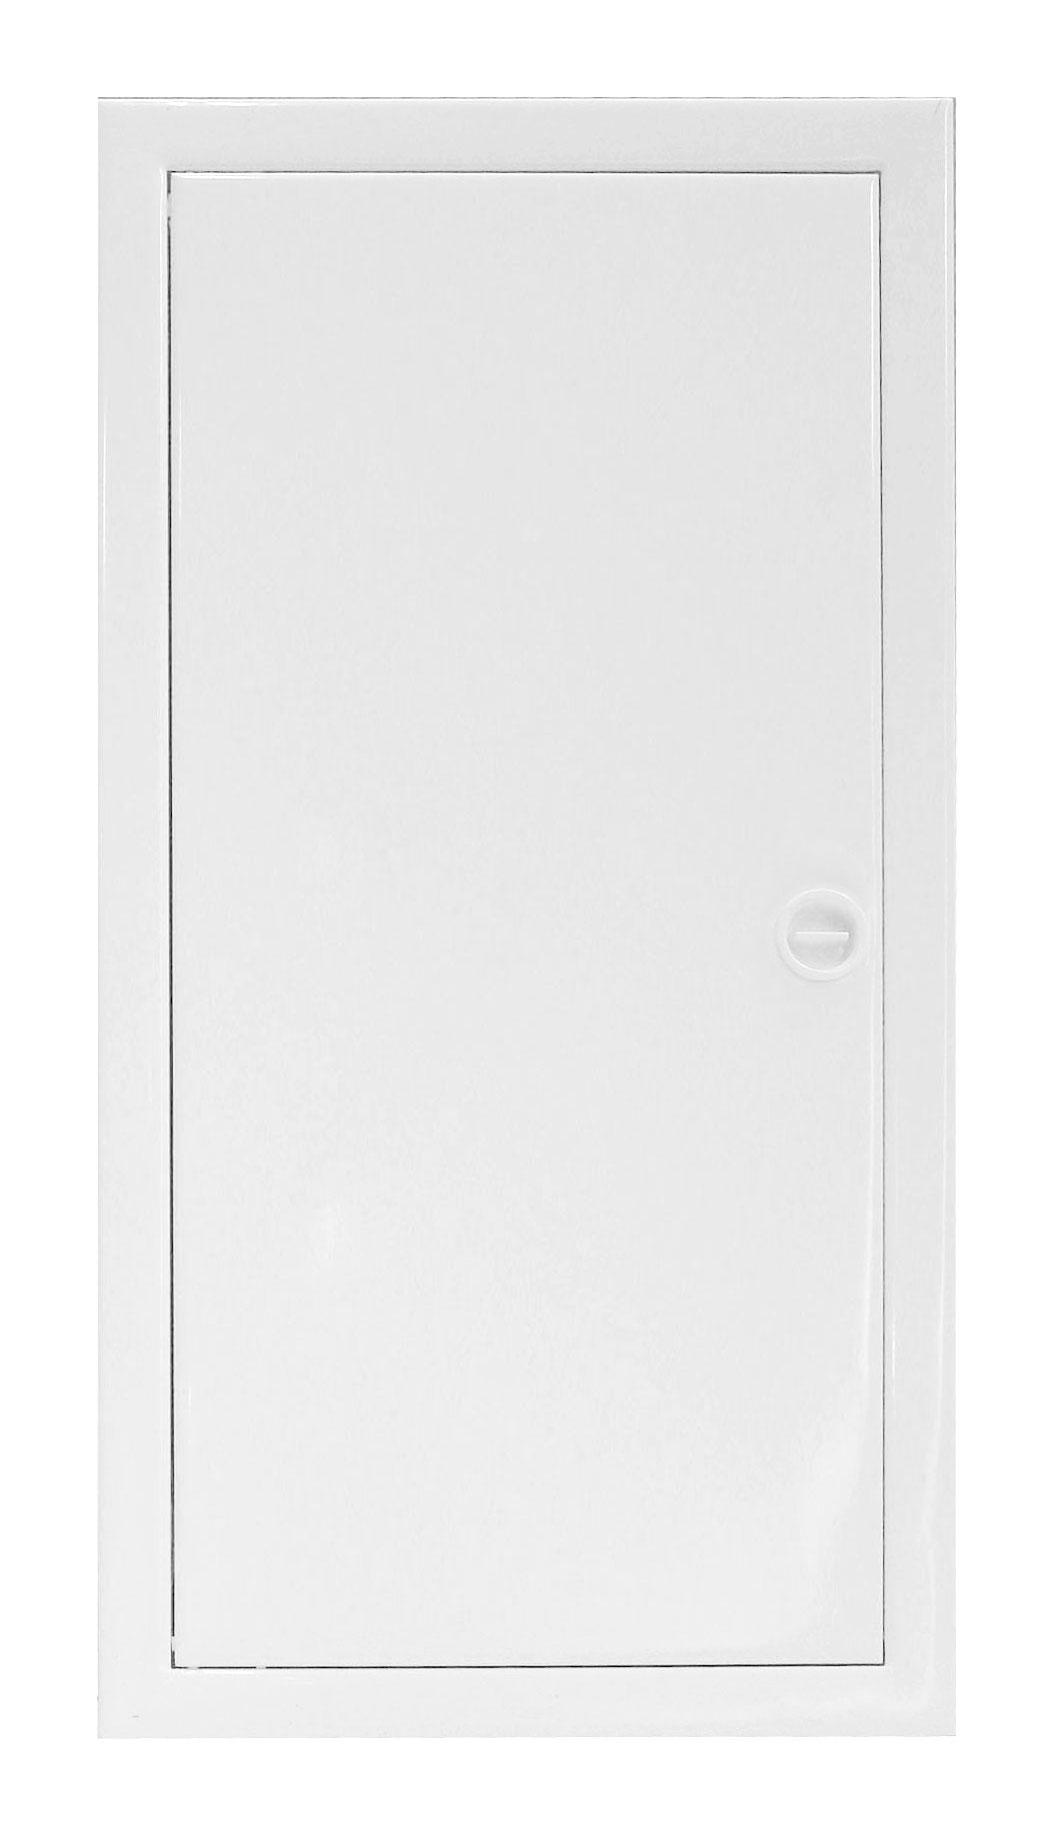 Rozvodnice zapuštěná ,4-řadá ,bílá 48 modulů